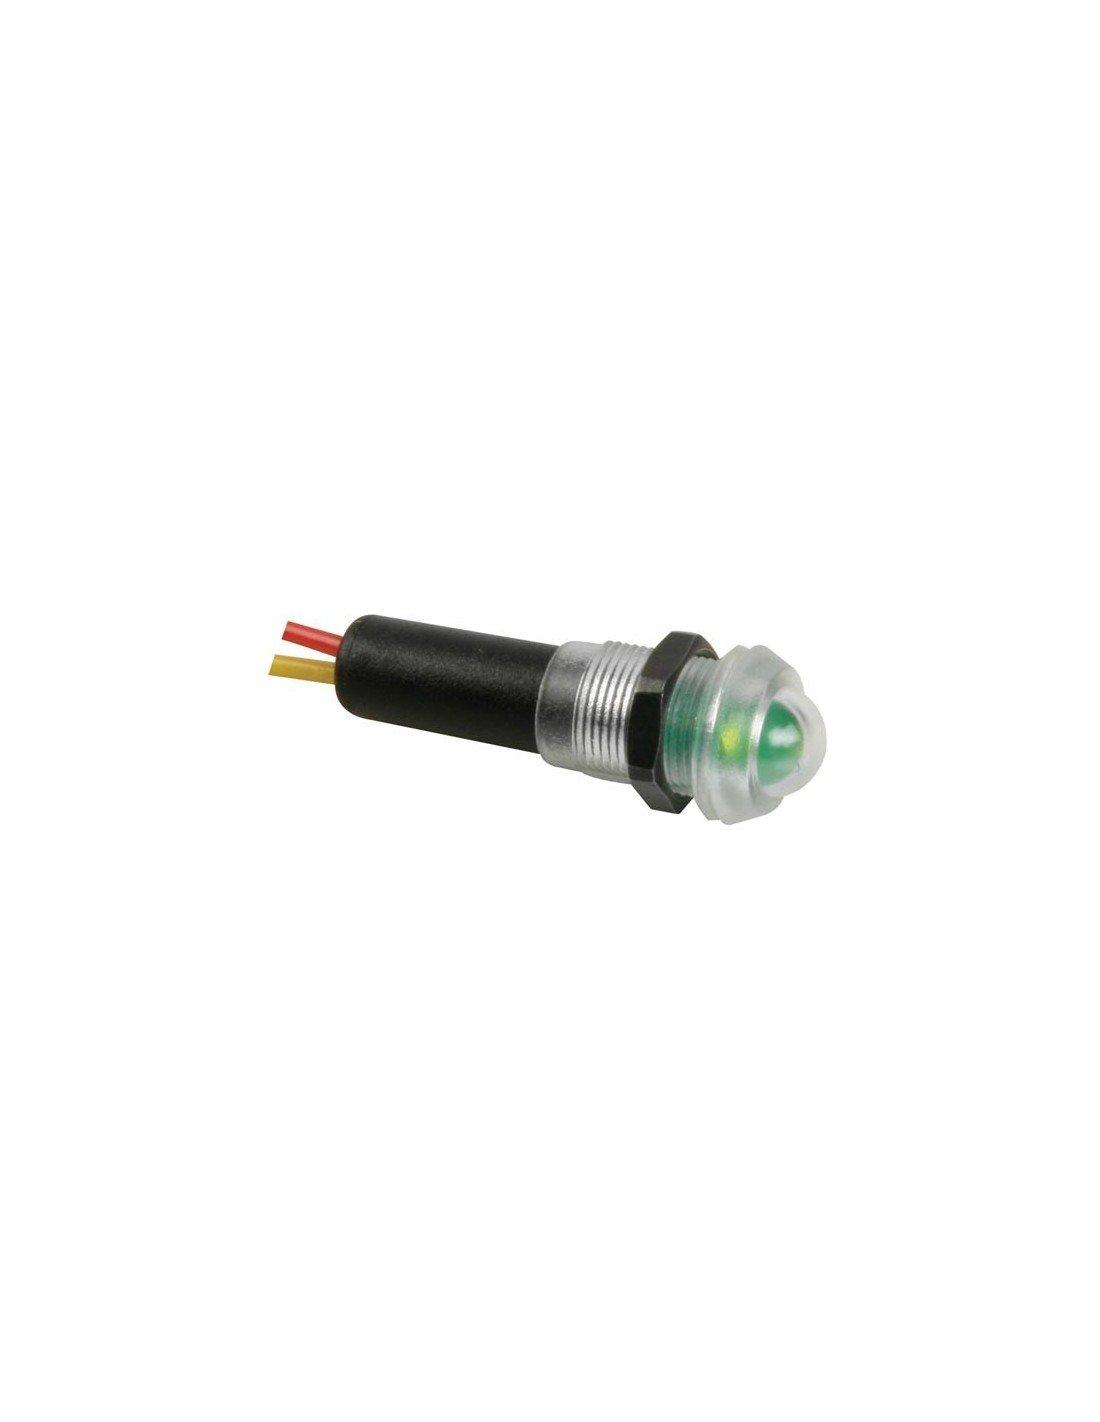 VS Electronic 124096 LED Signalleuchte, 12 V, Wasserdicht, Grü n VS Electronic Vertriebs GmbH